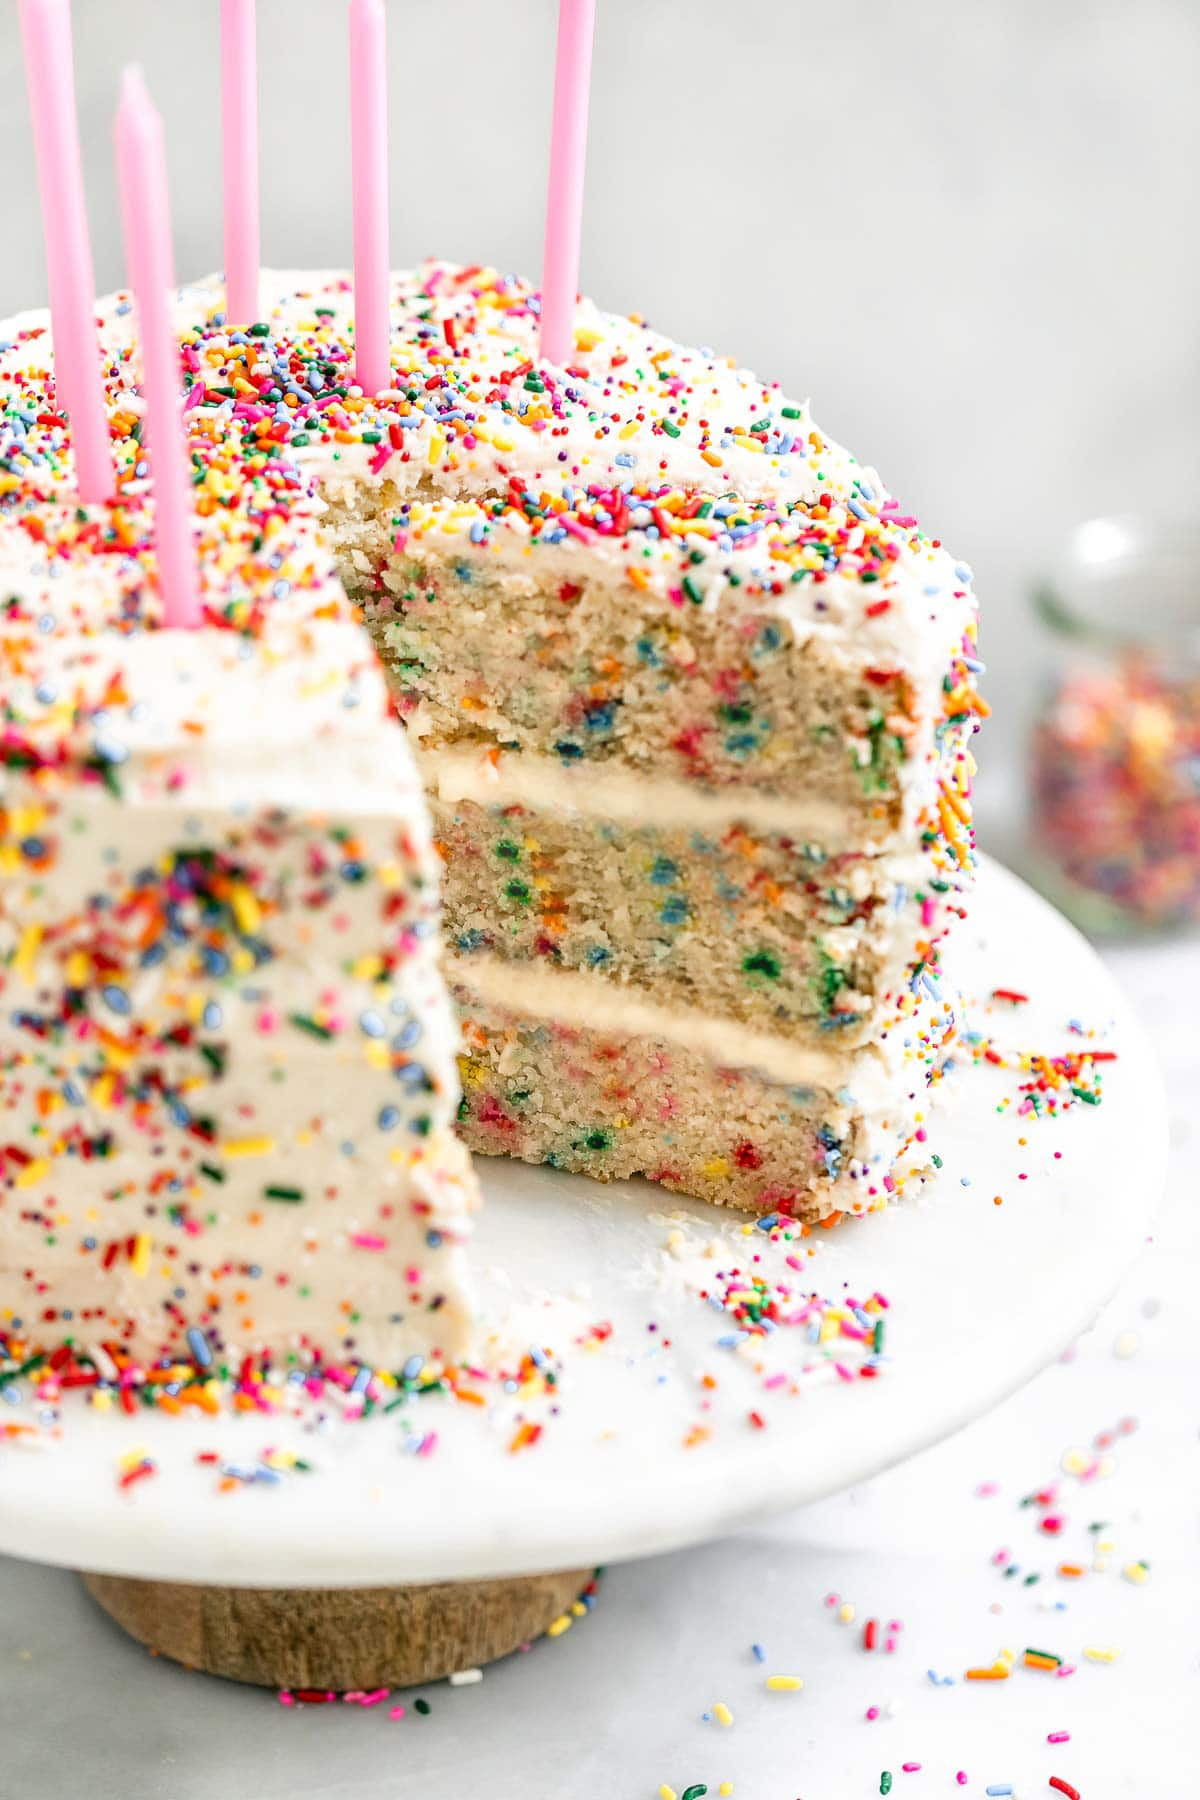 vegan gluten free funfetti cake on a cake stand.